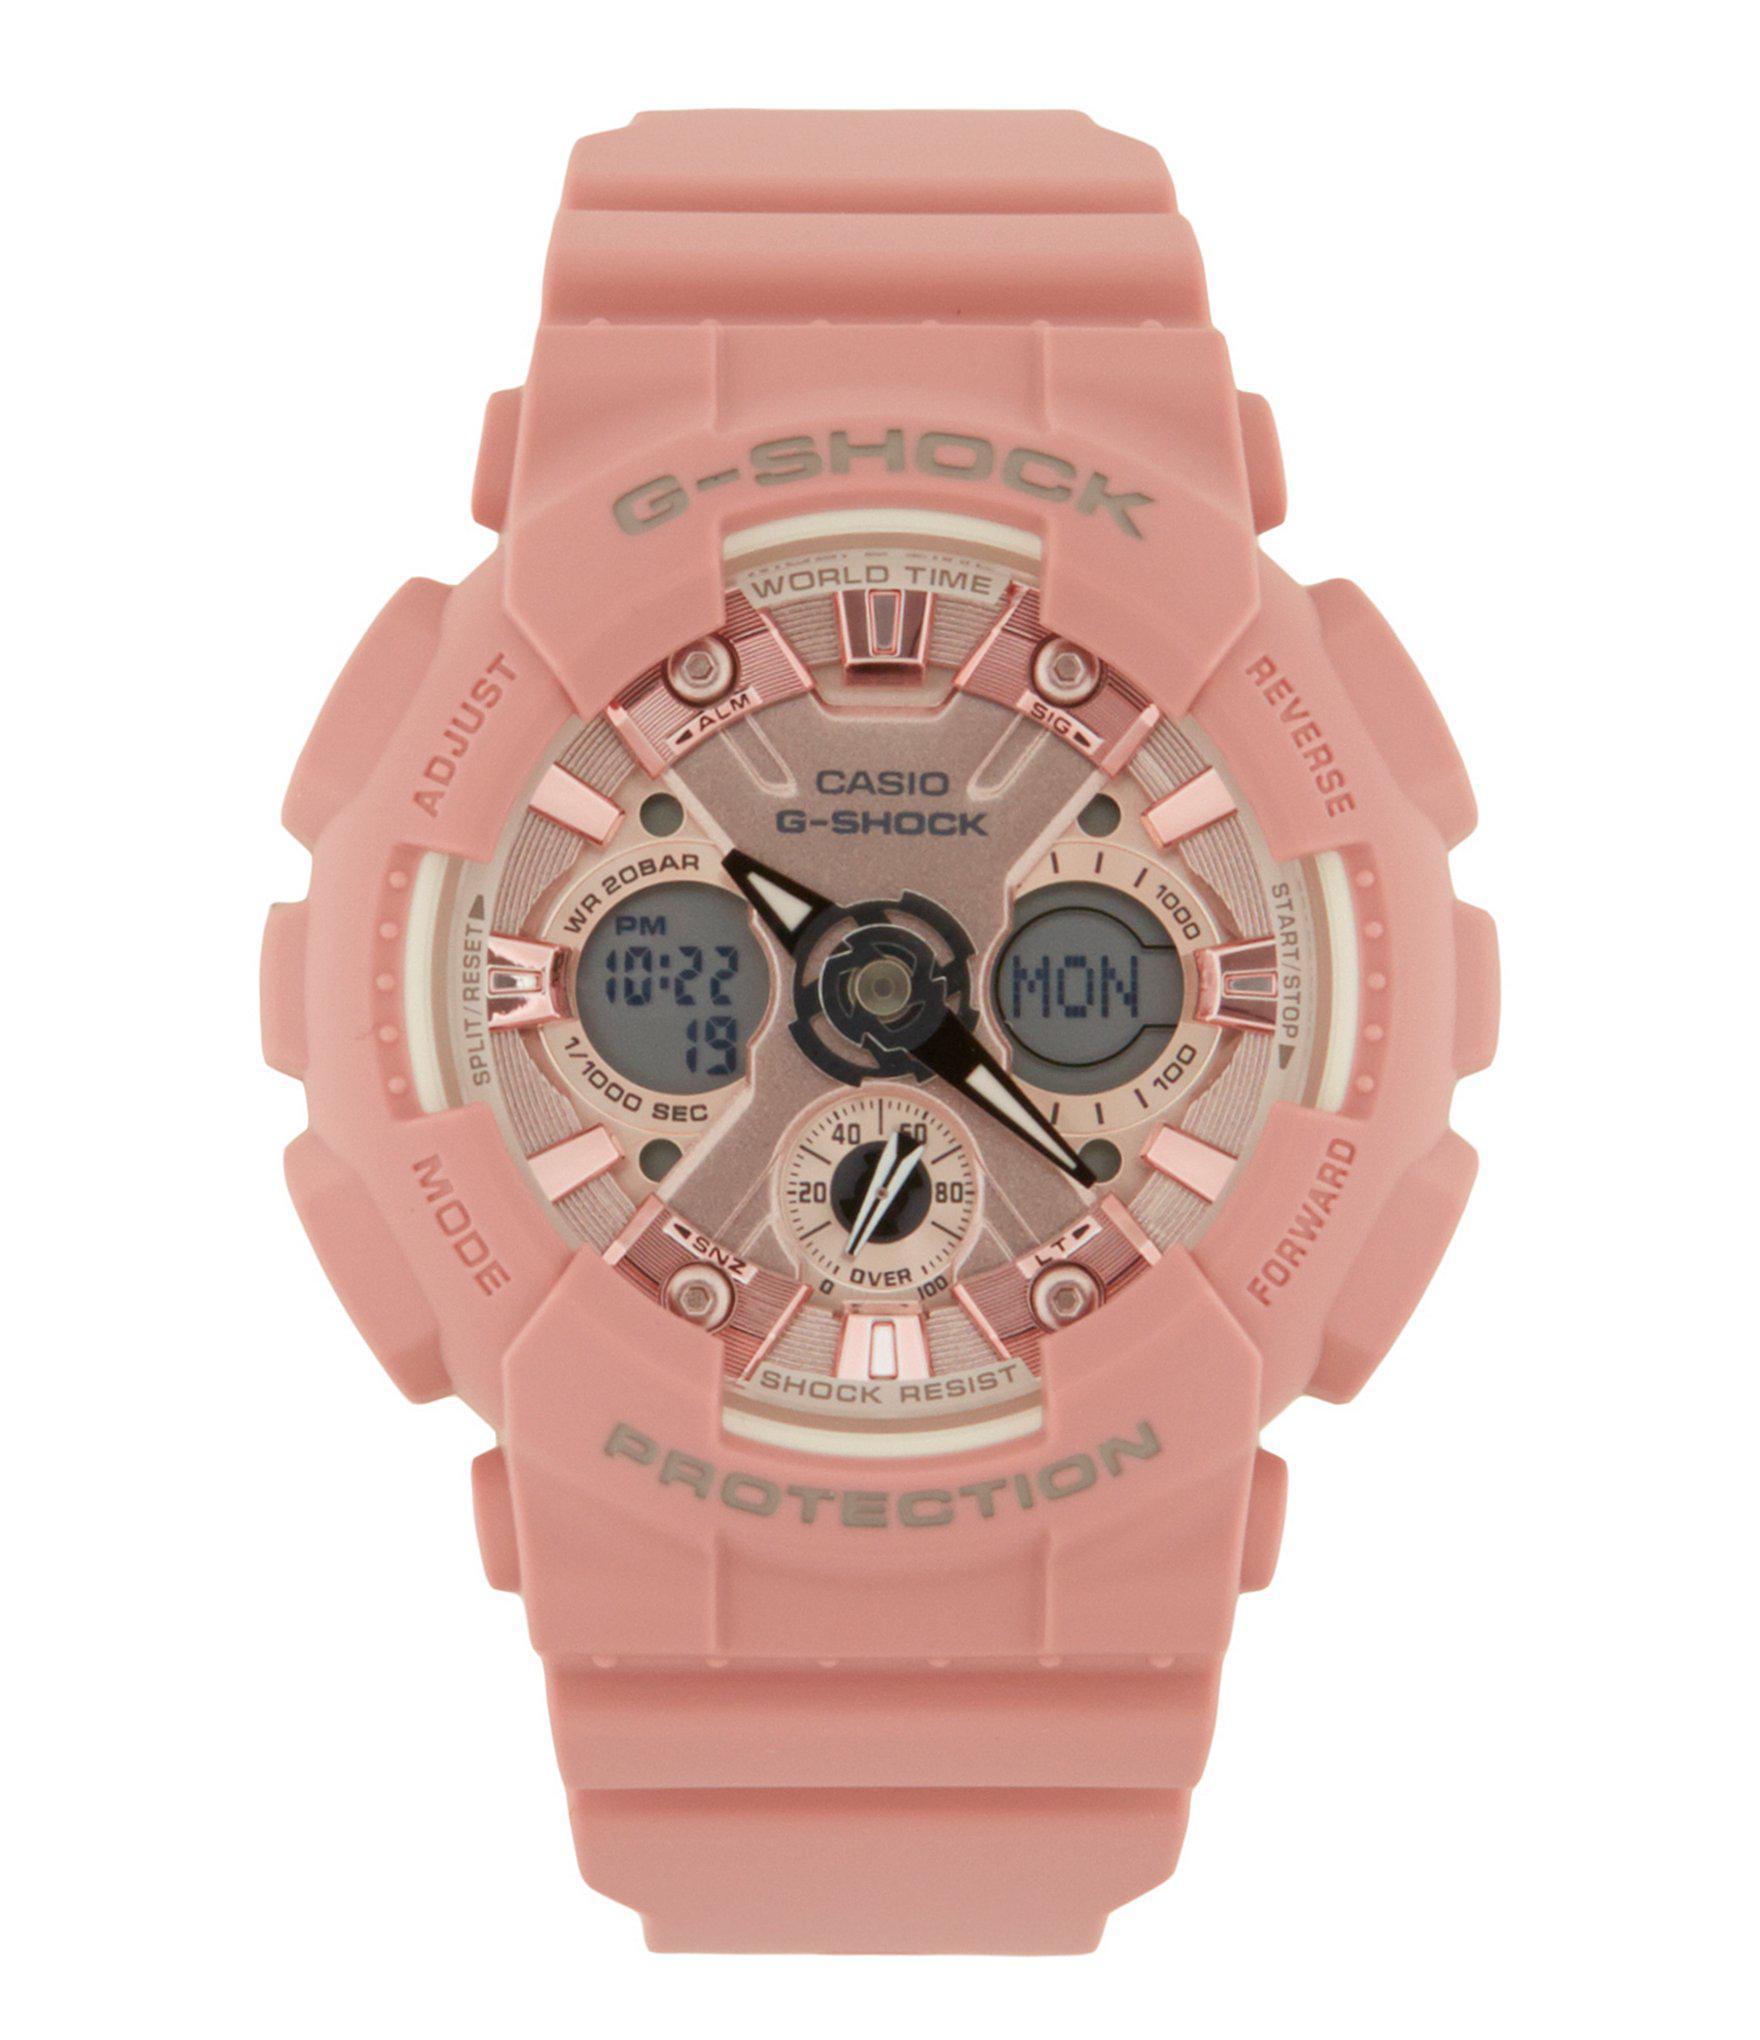 e6c82d71f G-Shock S Series Pastel Rose Pink Ana/digi Watch. View fullscreen